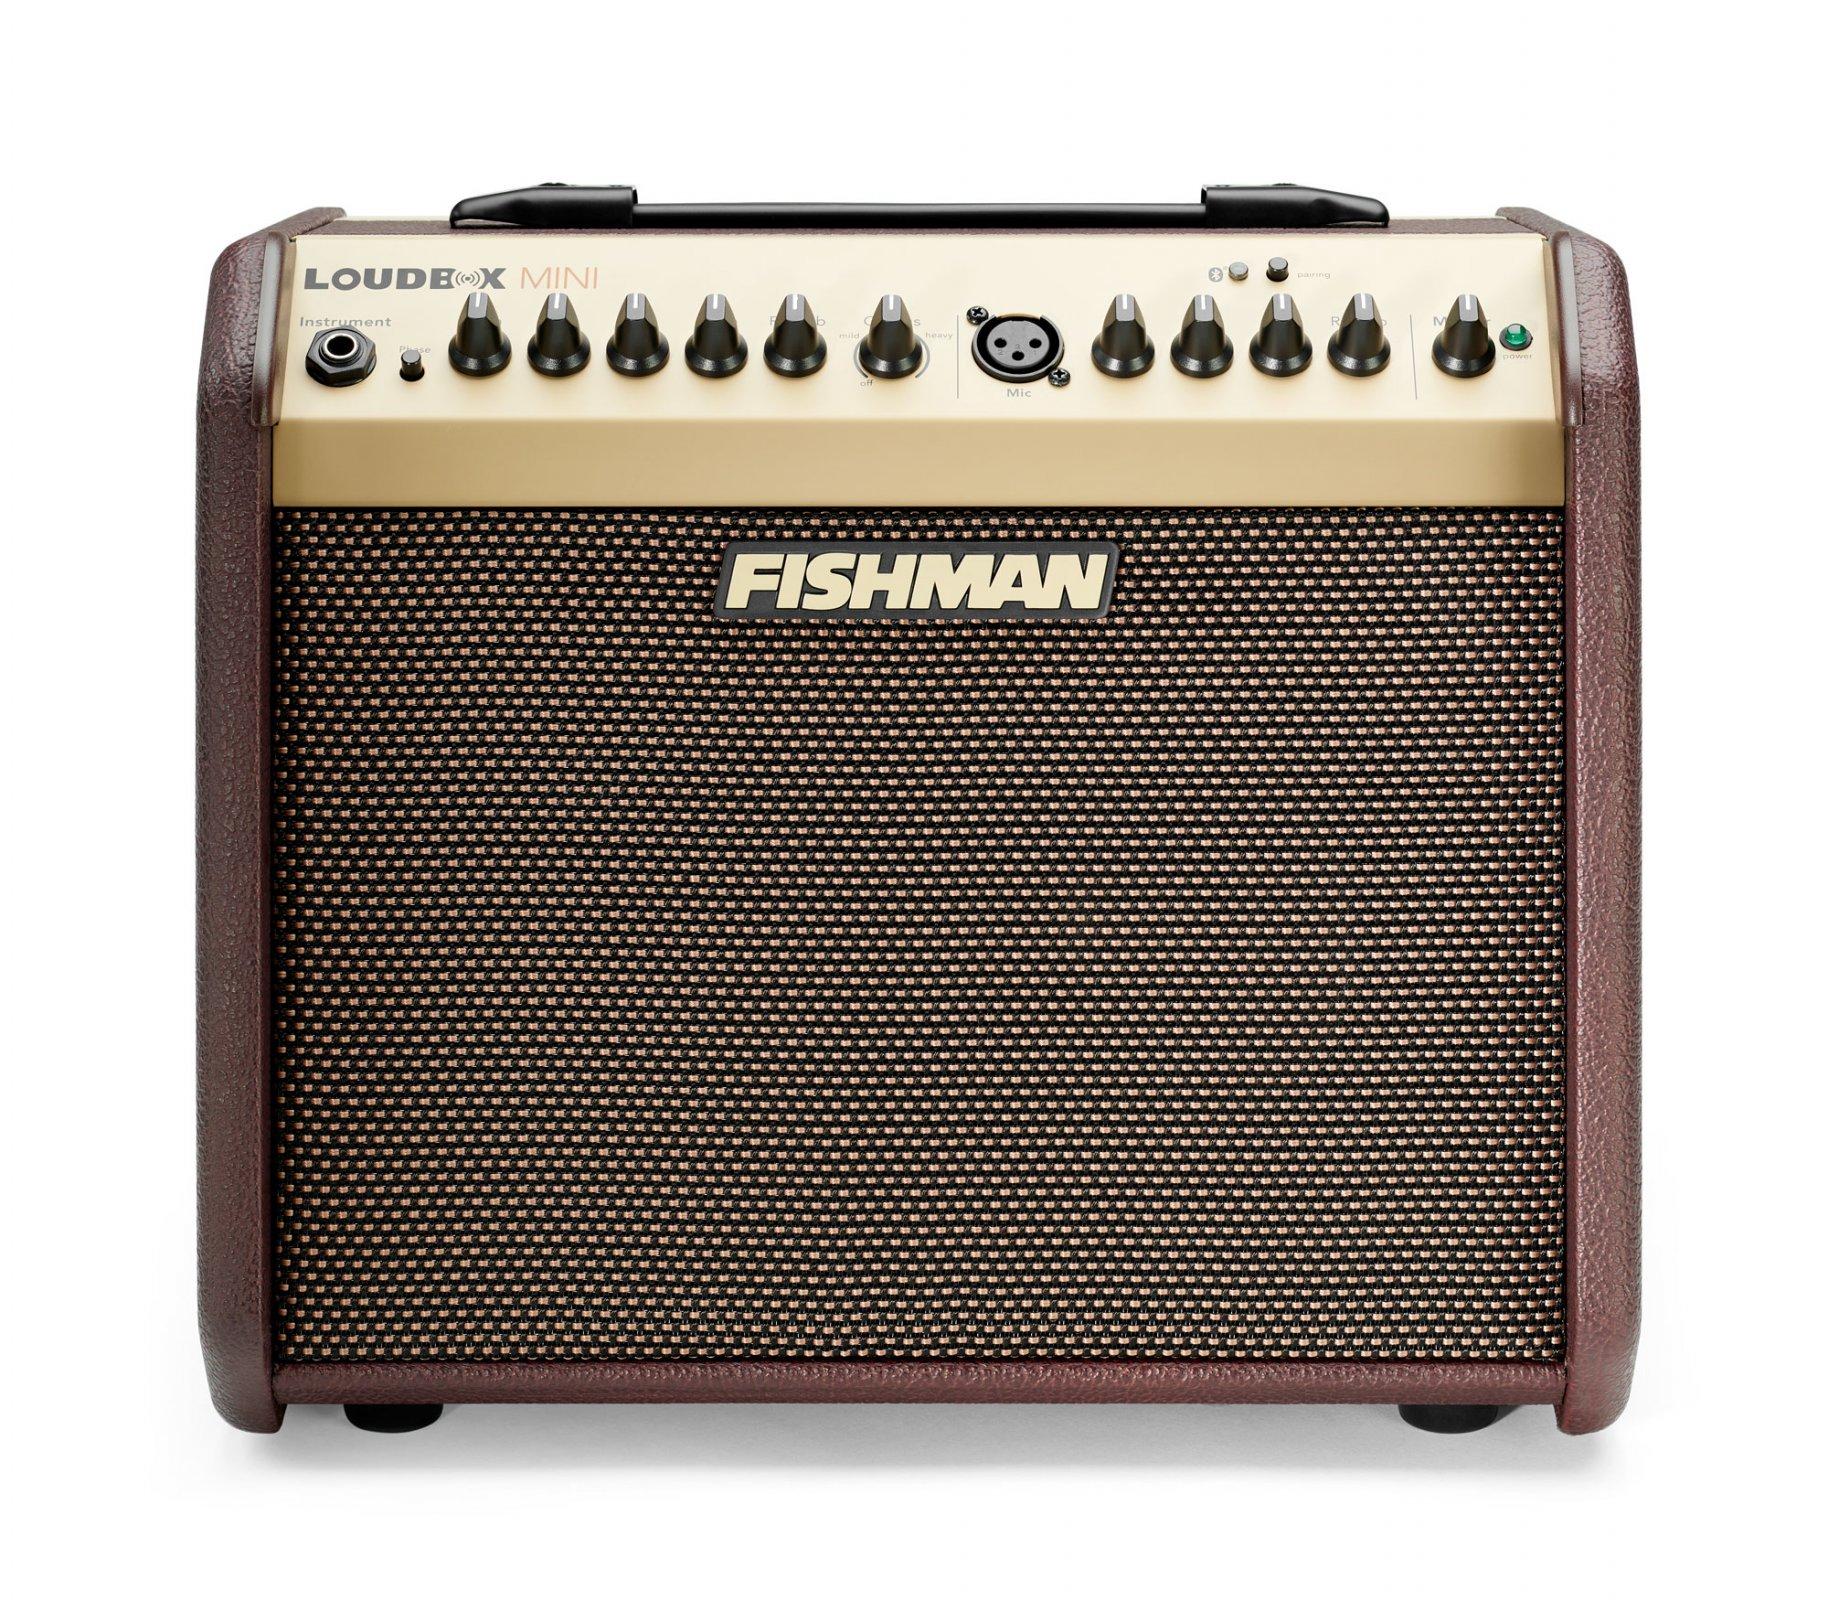 Fishman Loudbox Mini PRO-LBT-500 Acoustic Combo Amplifier